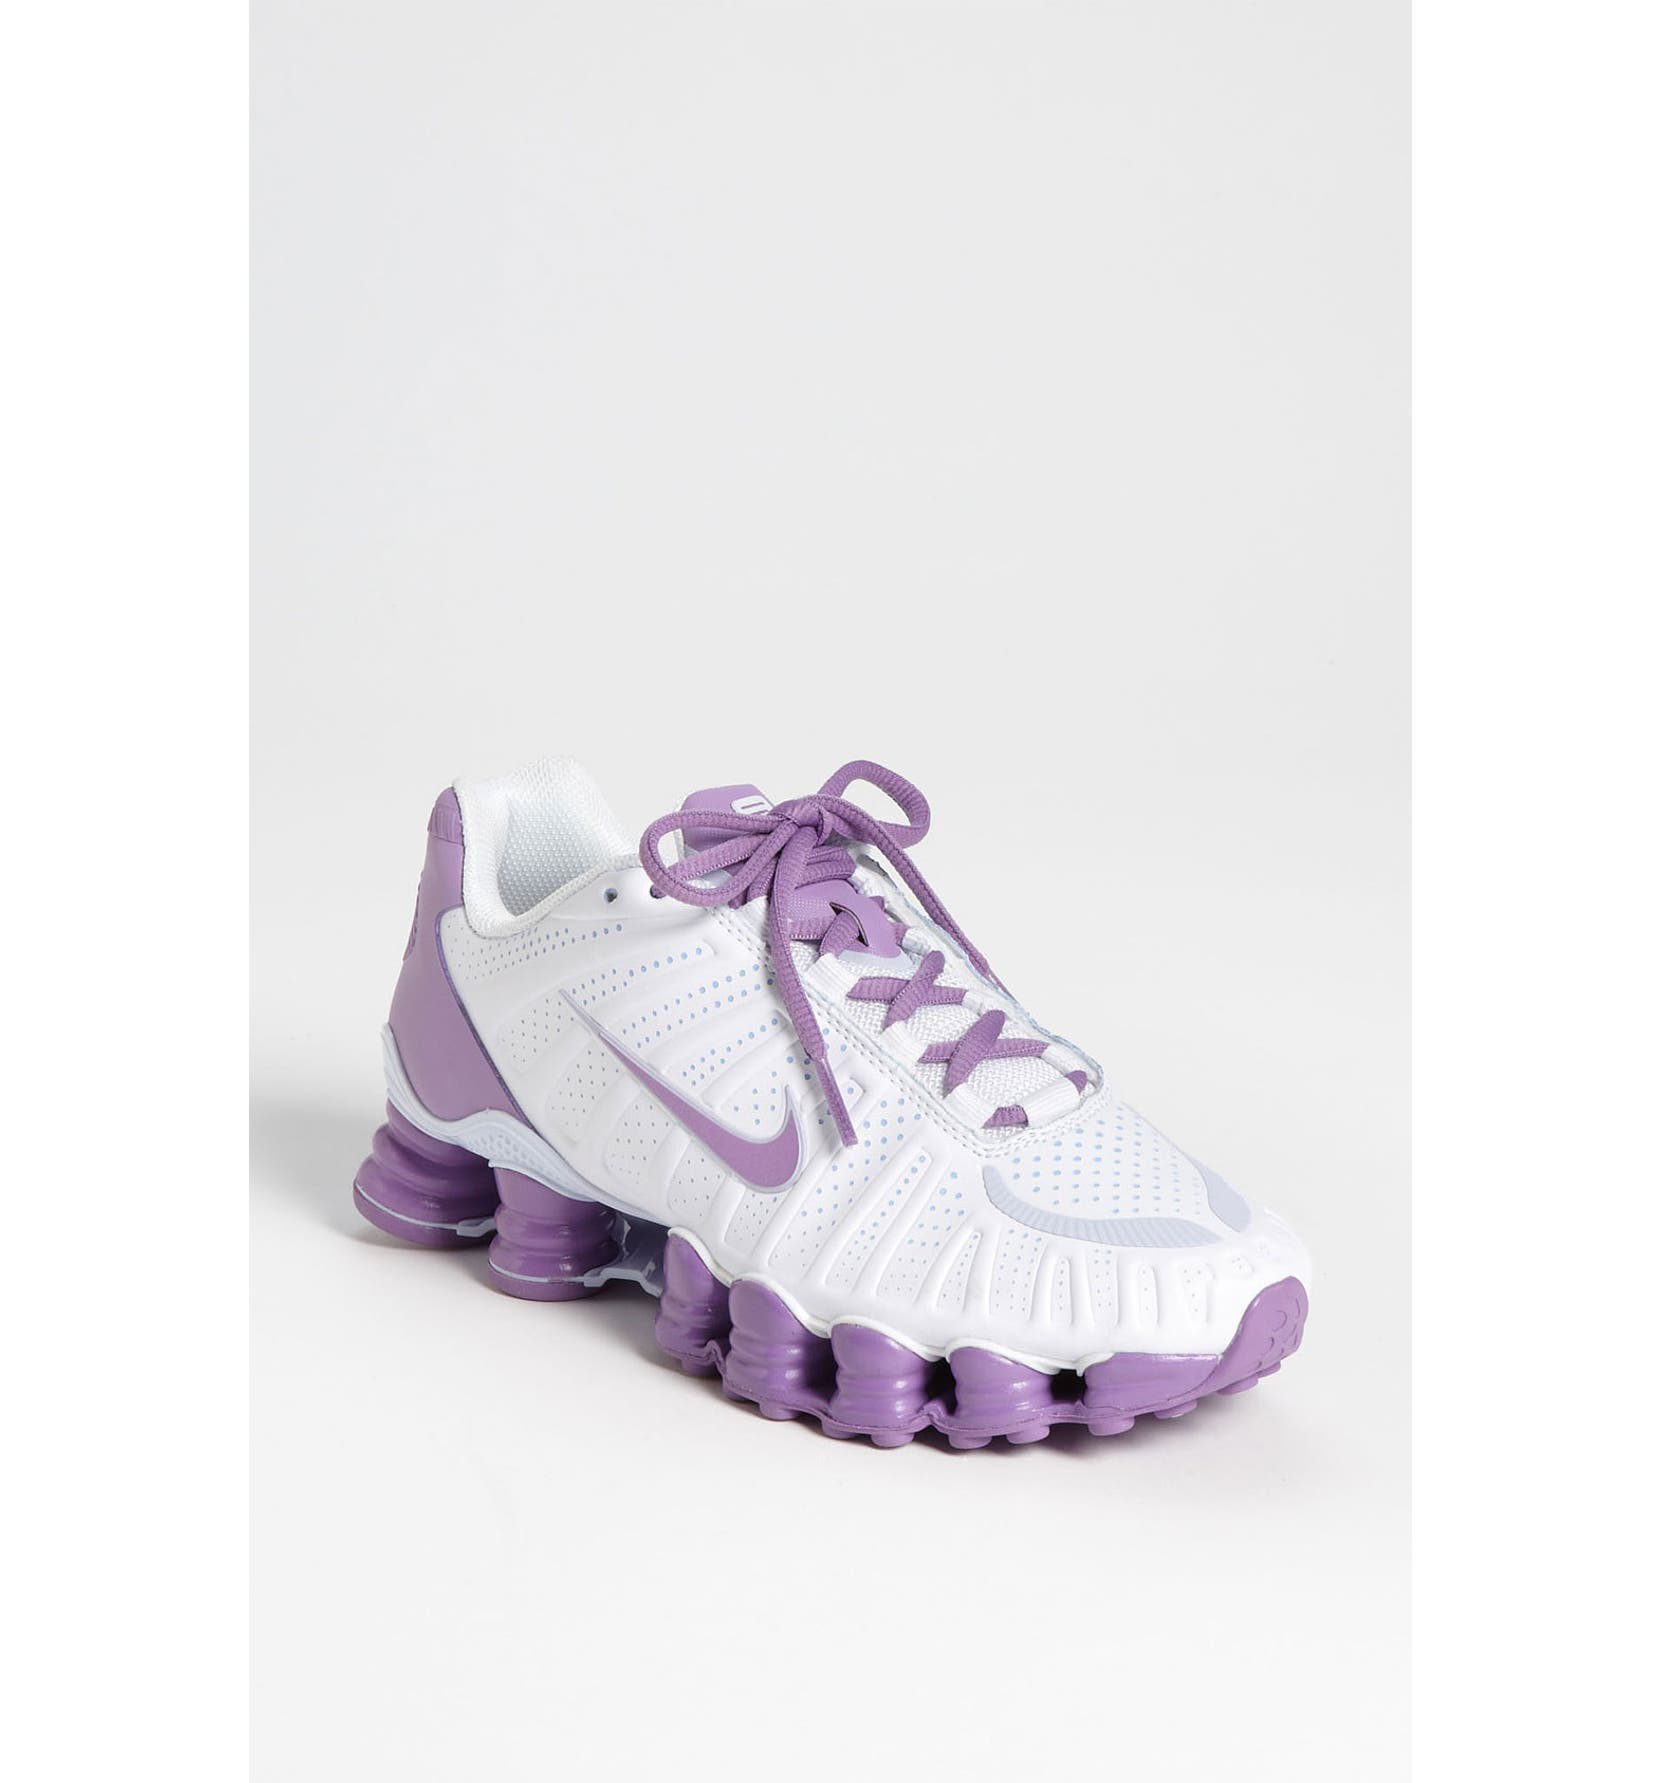 online retailer 8ec76 89048 best website 9f002 3ef22 nike shox tlx womens tennis shoes ...